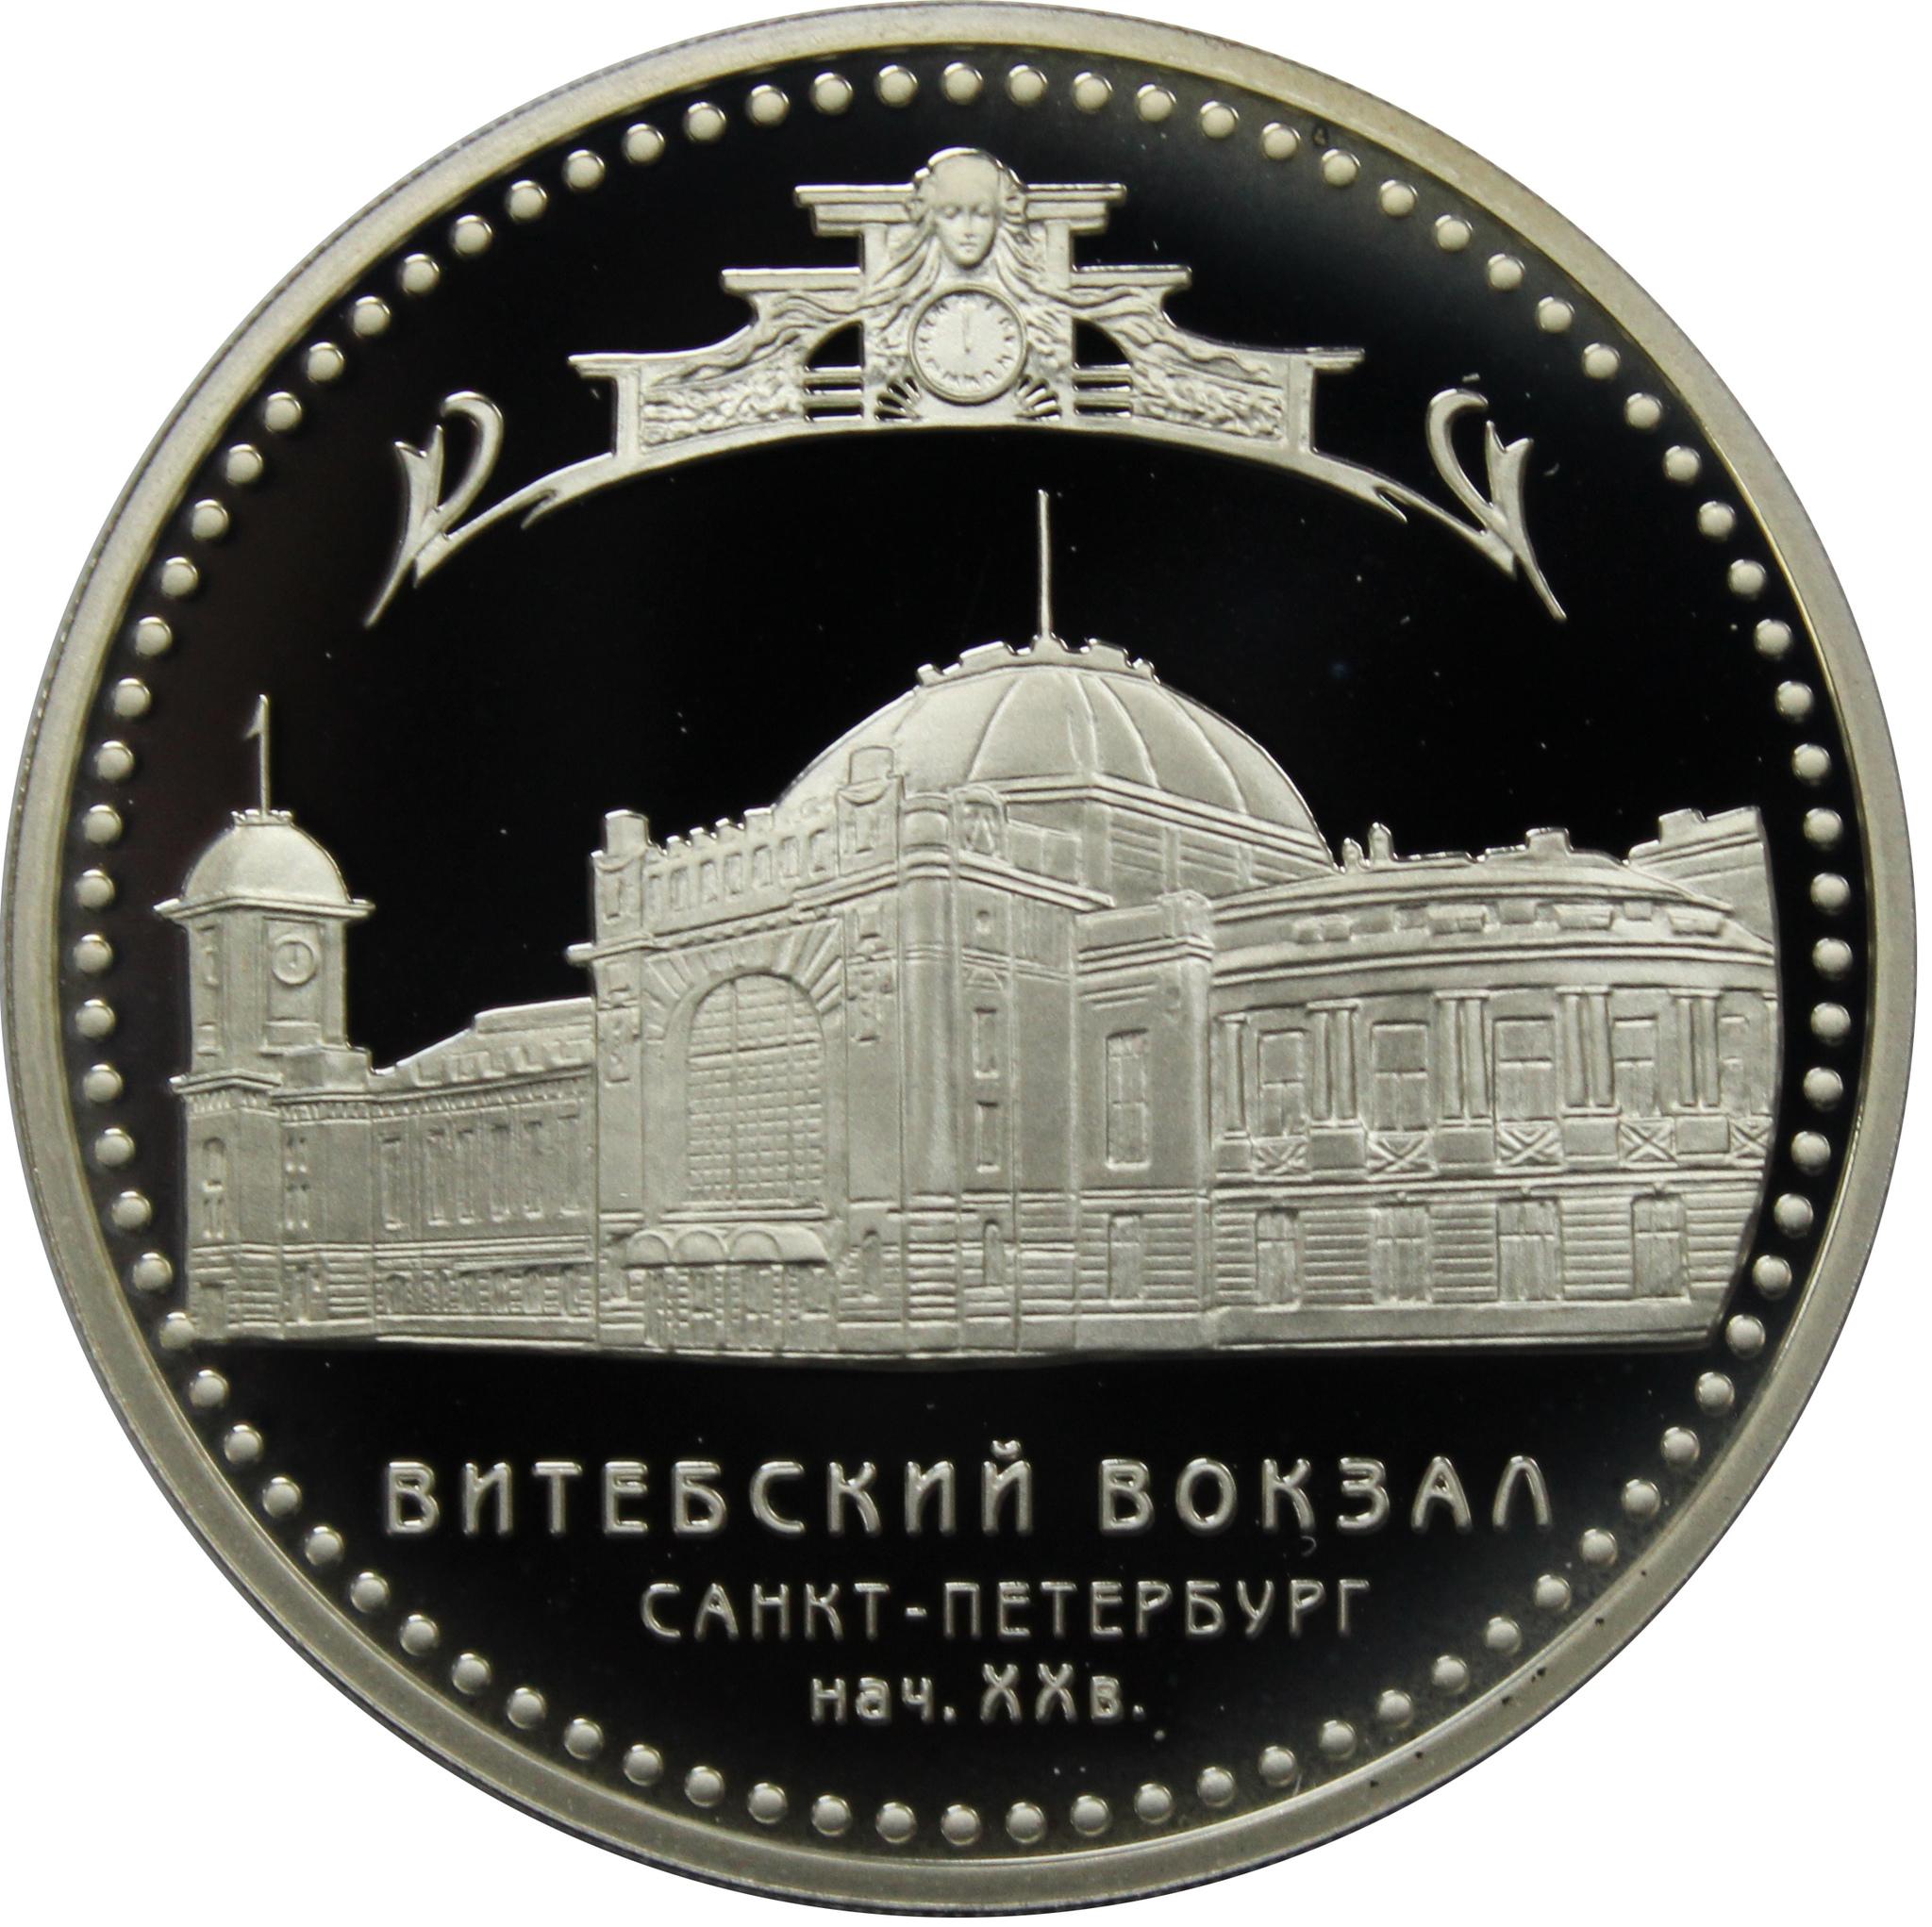 3 рубля 2009 Витебский вокзал в Санкт-Петербурге